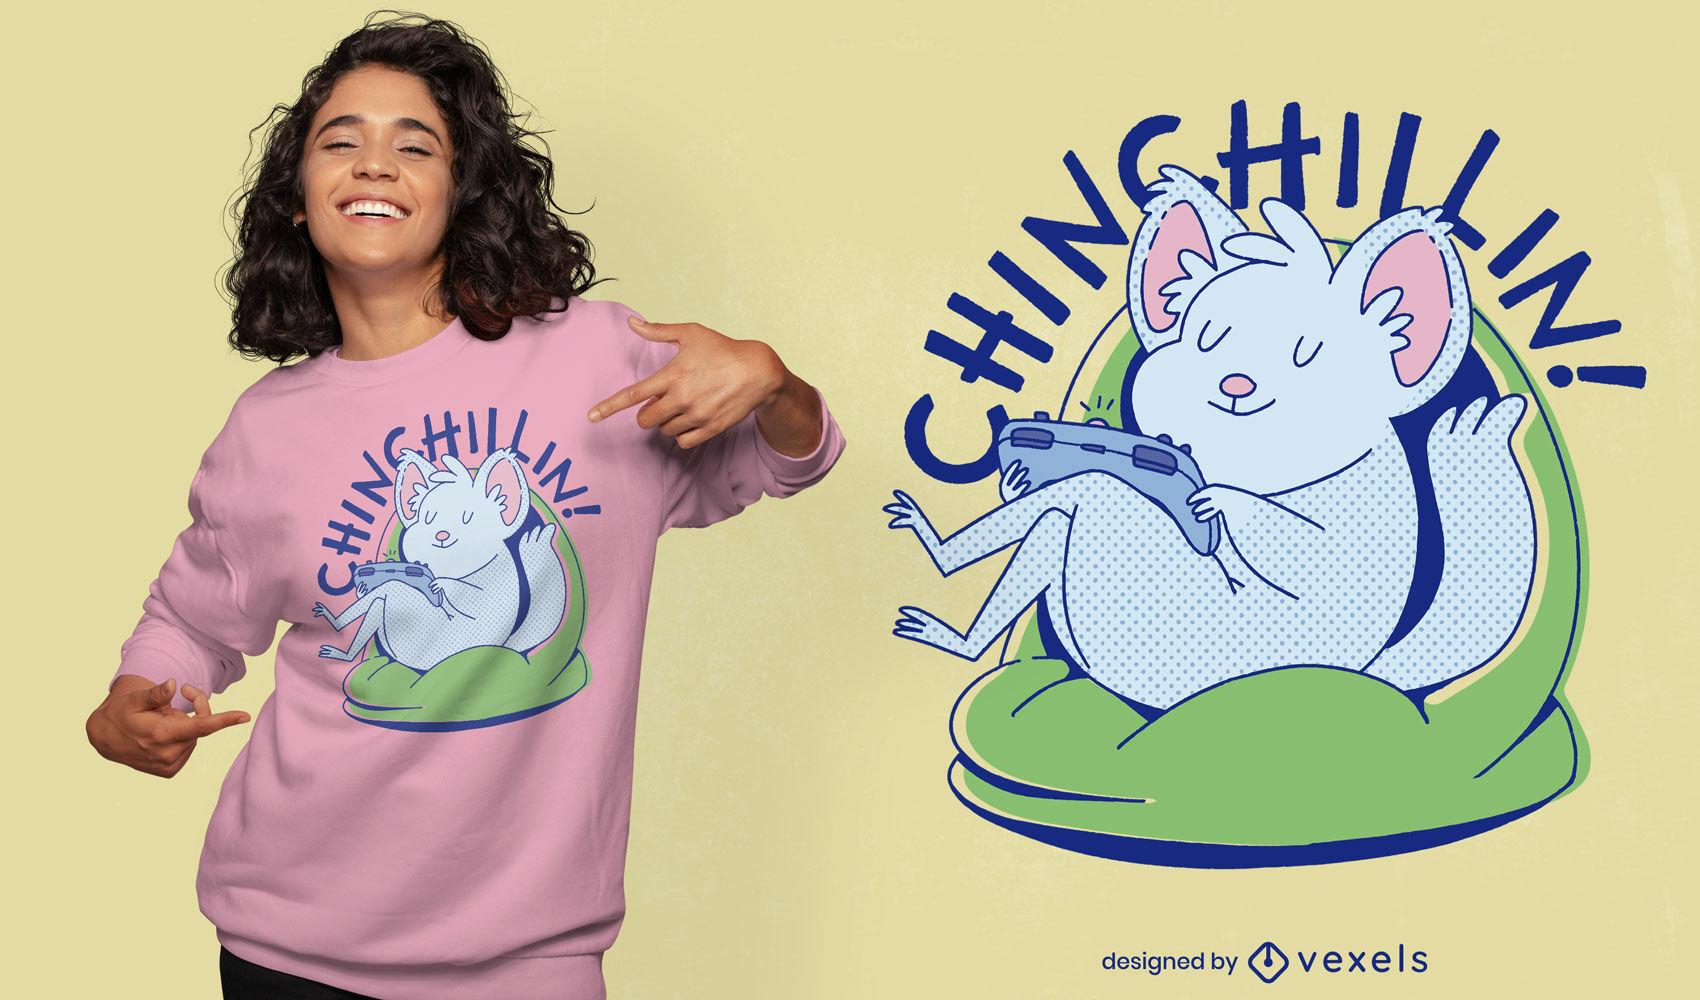 Cute chinchilla chilling t-shirt design